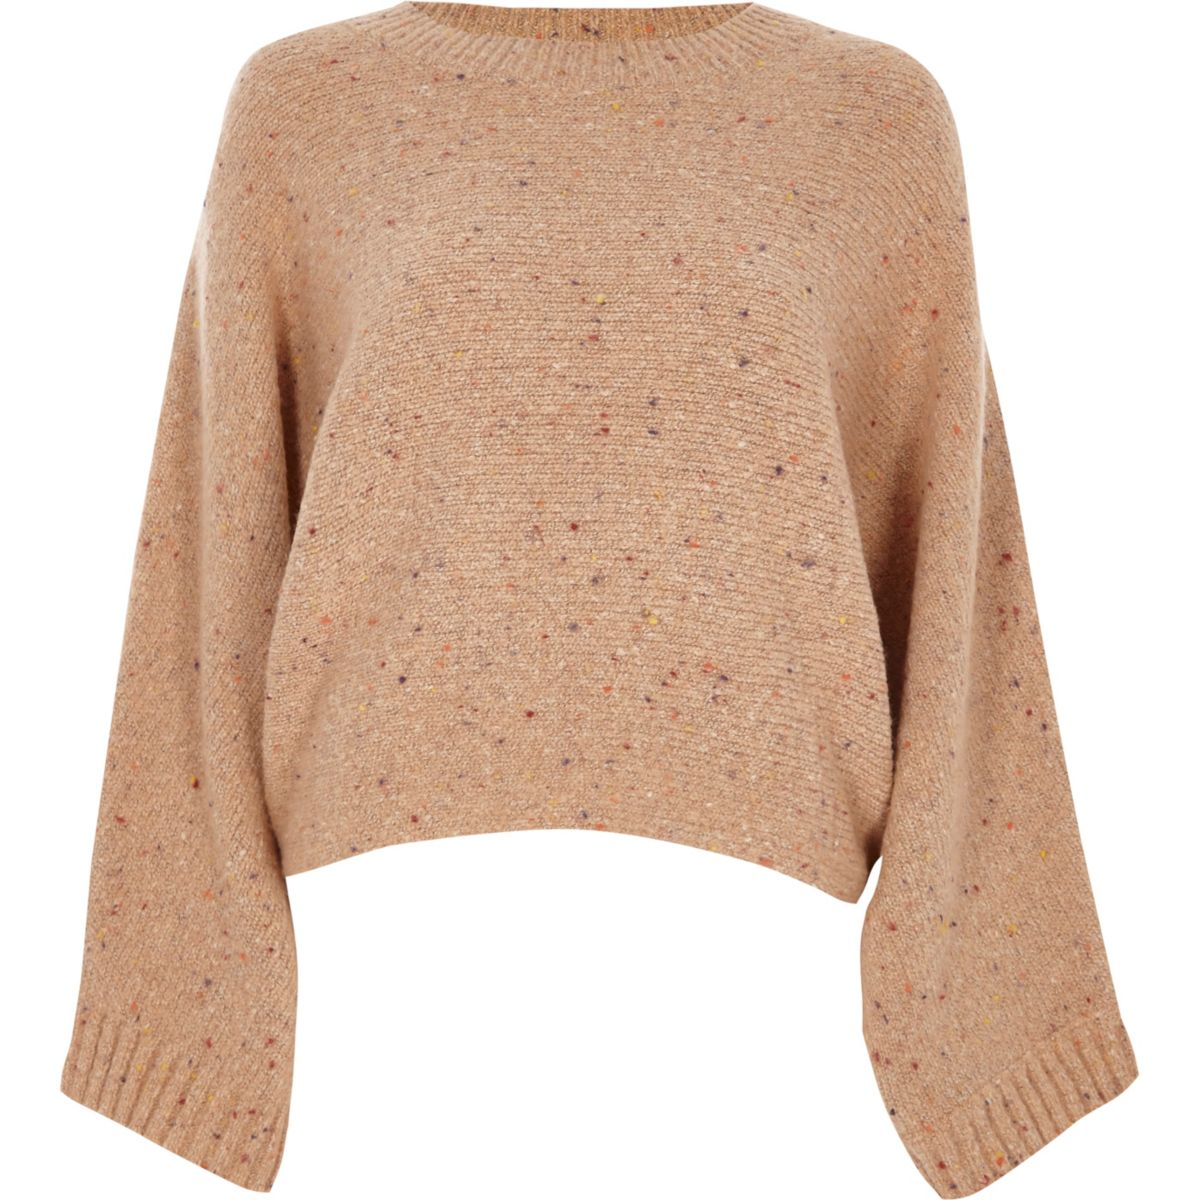 Beige flecked knit crew neck boxy jumper